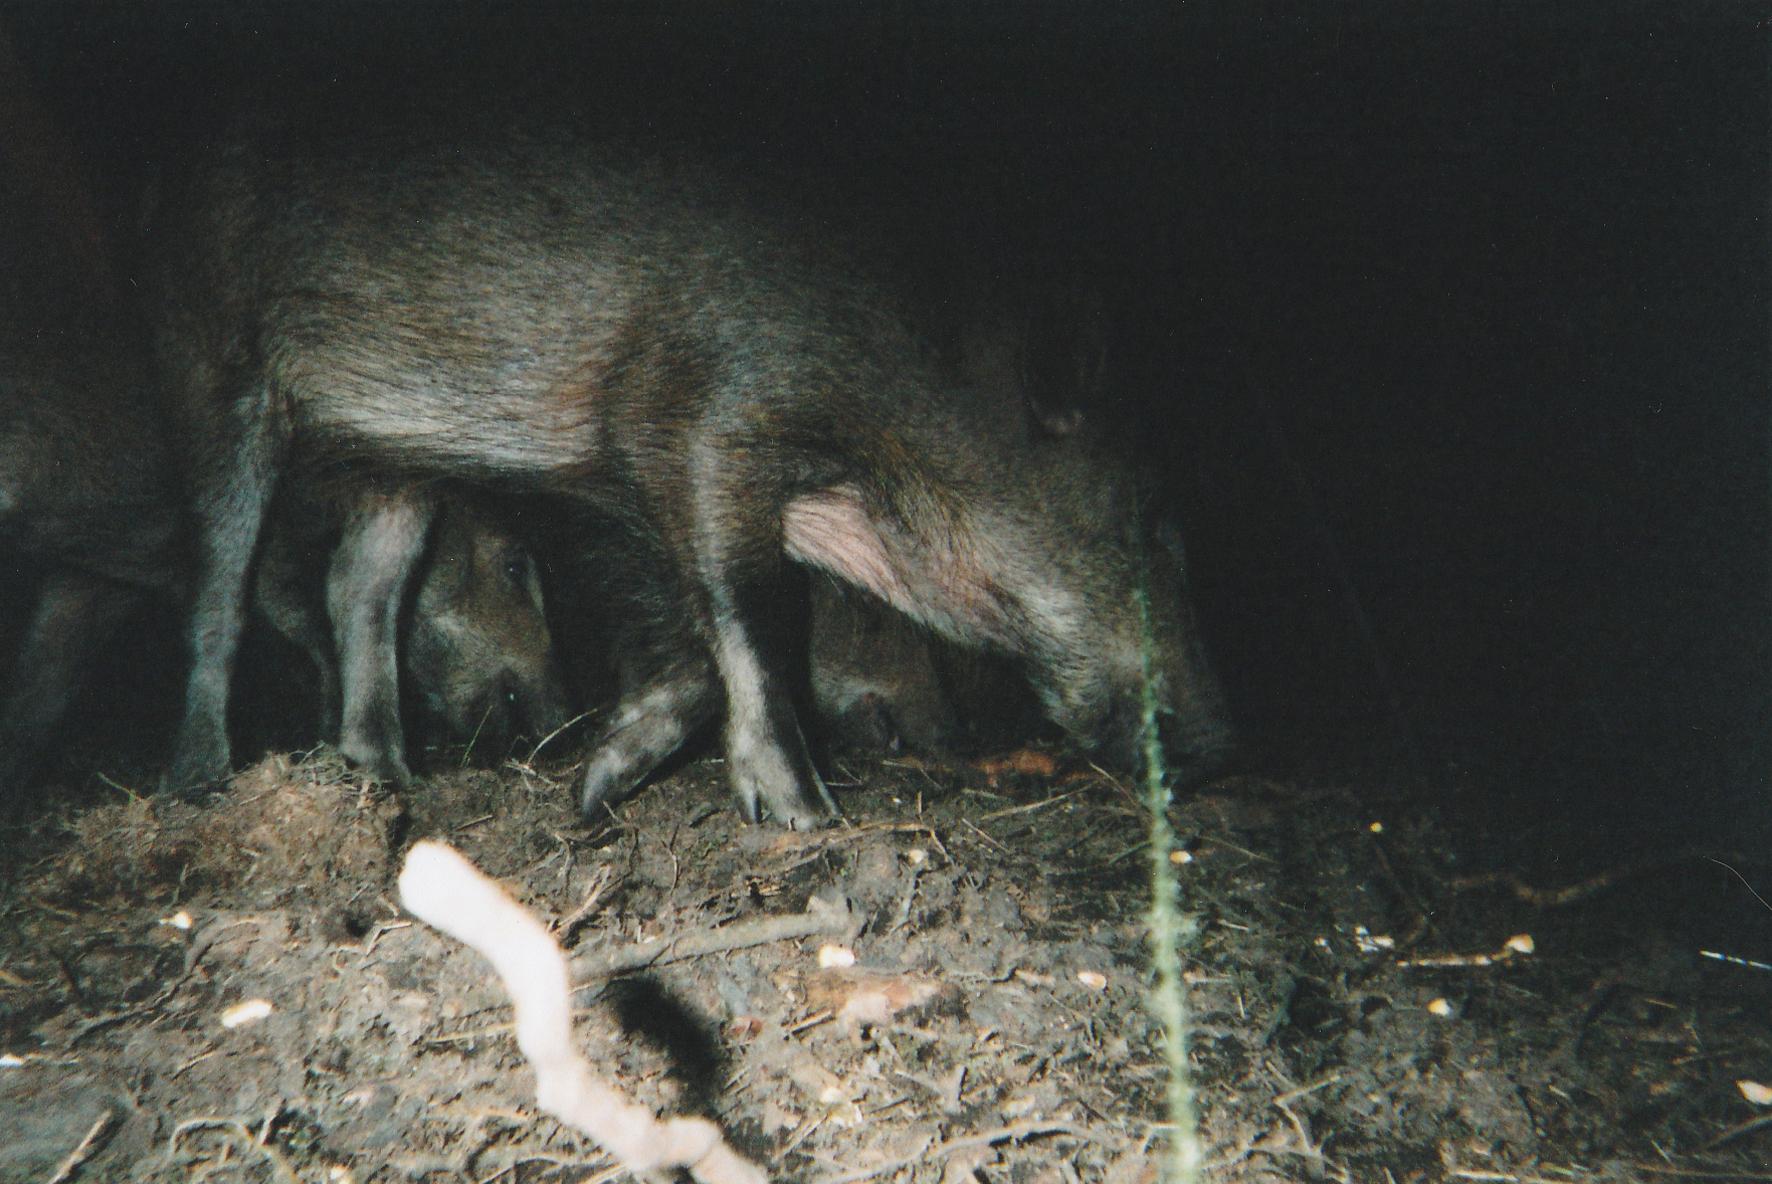 Wild Boar Photos 14.jpg